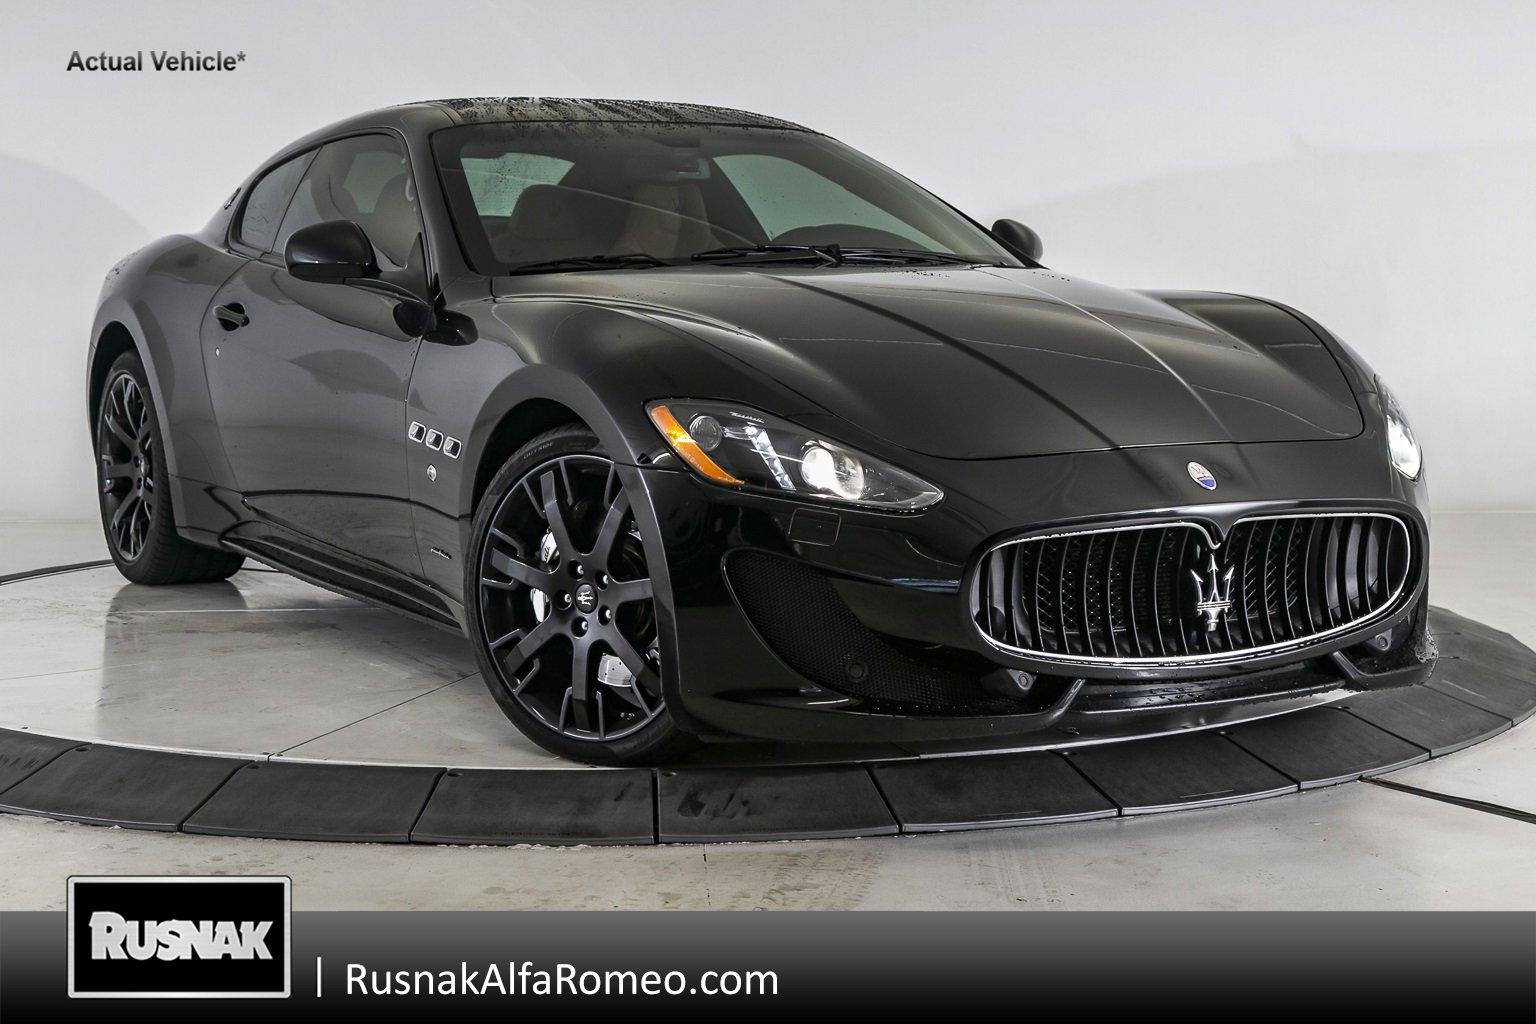 2017 Maserati GranTurismo Sport image